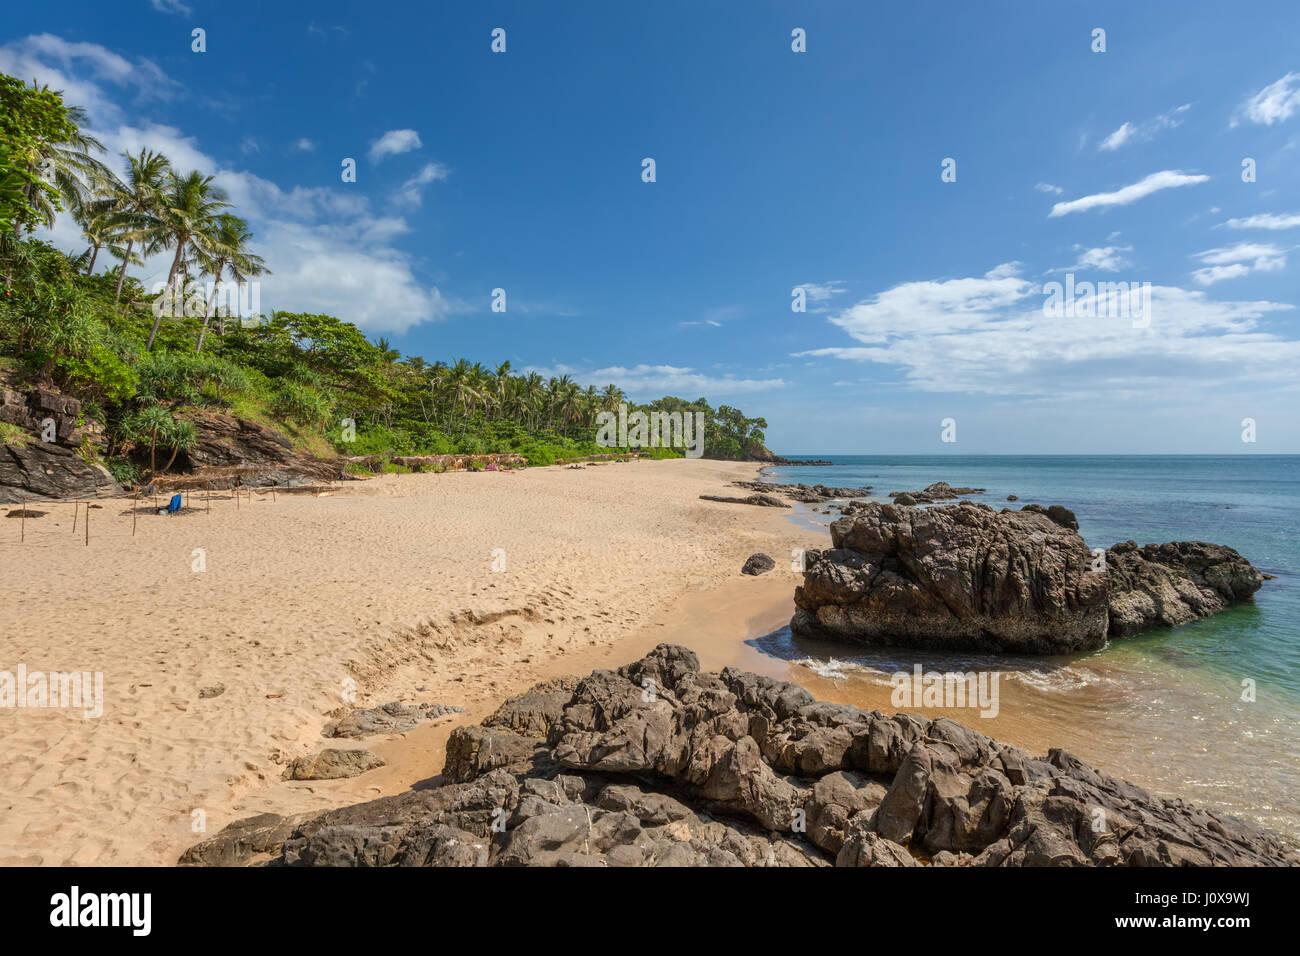 Diamond Cliff beach on Koh Lanta Yai, Krabi Province, Thailand, Southeast Asia - Stock Image